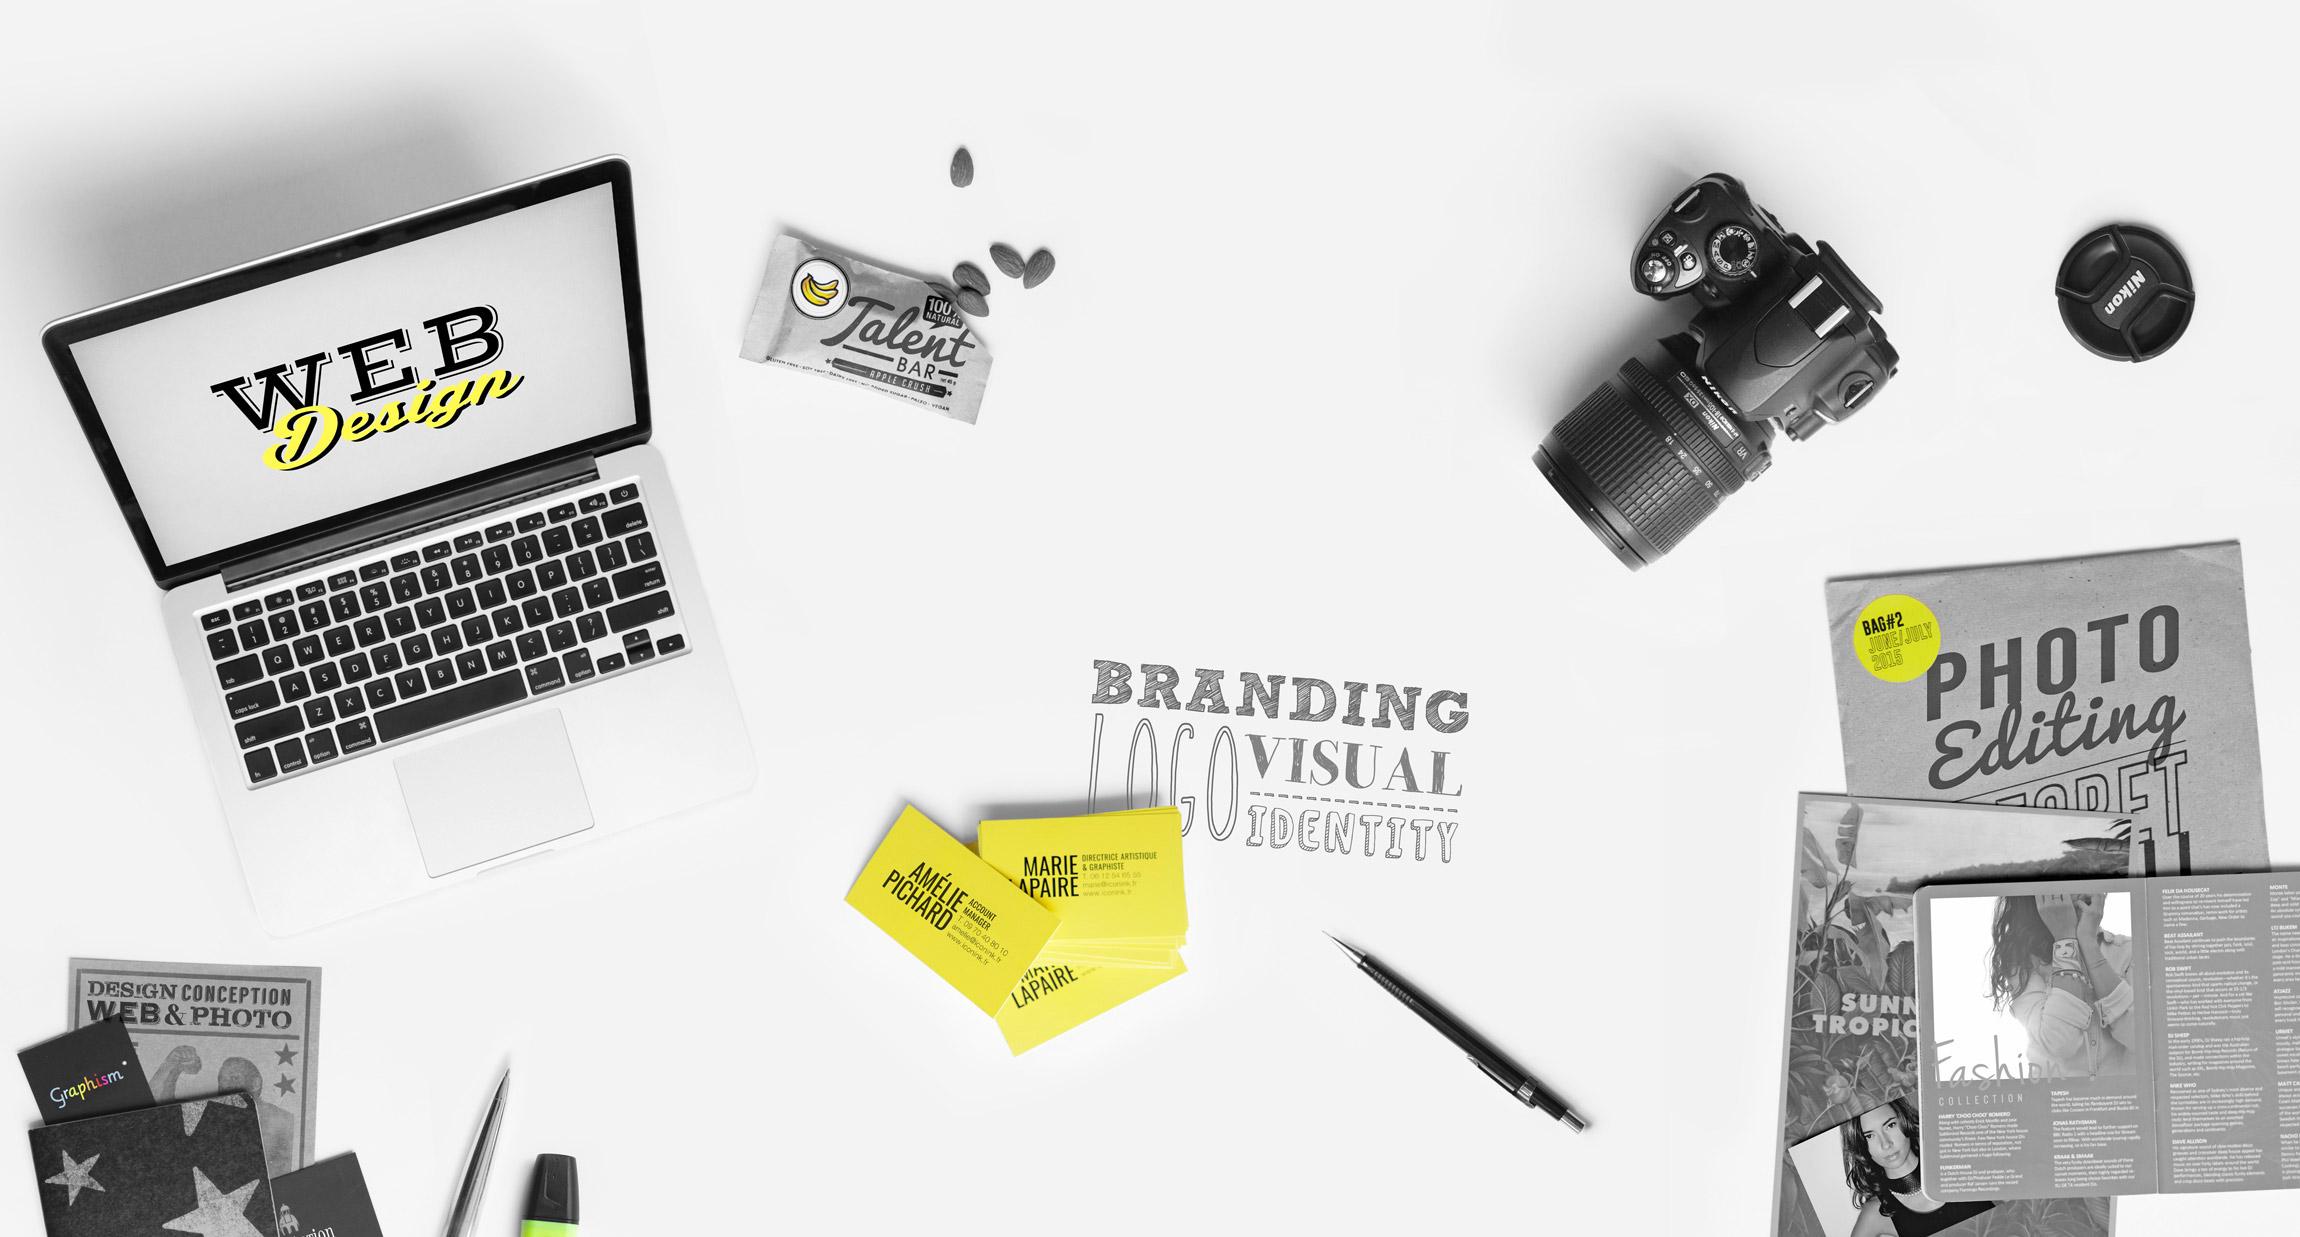 Iconink - Web Design, Graphism & Branding agency